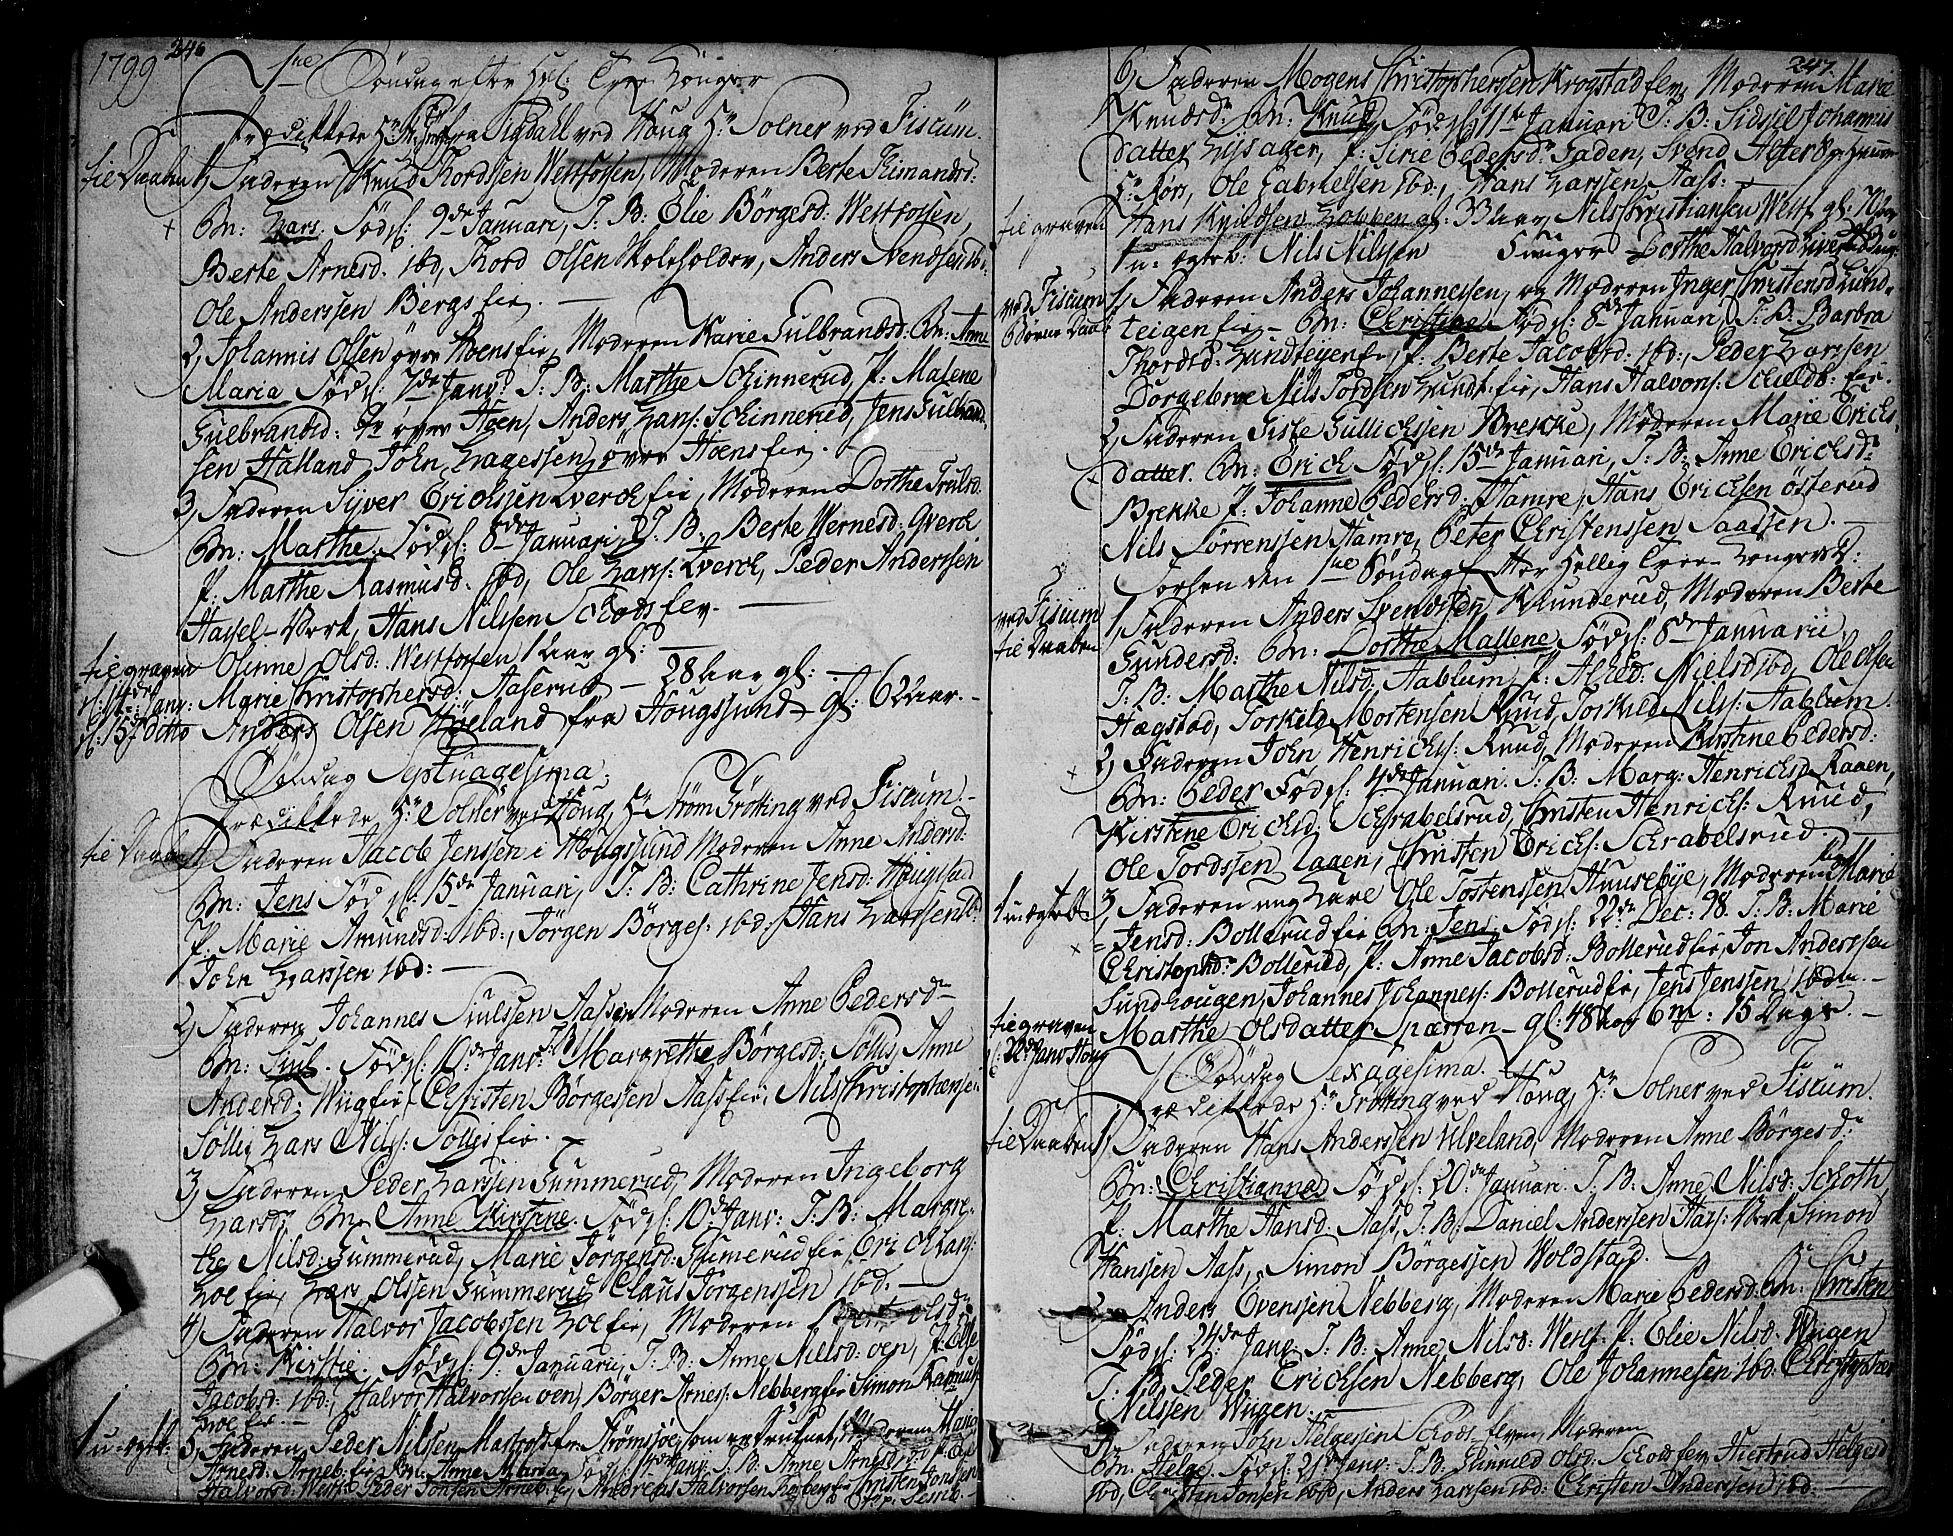 SAKO, Eiker kirkebøker, F/Fa/L0009: Ministerialbok nr. I 9, 1789-1806, s. 246-247